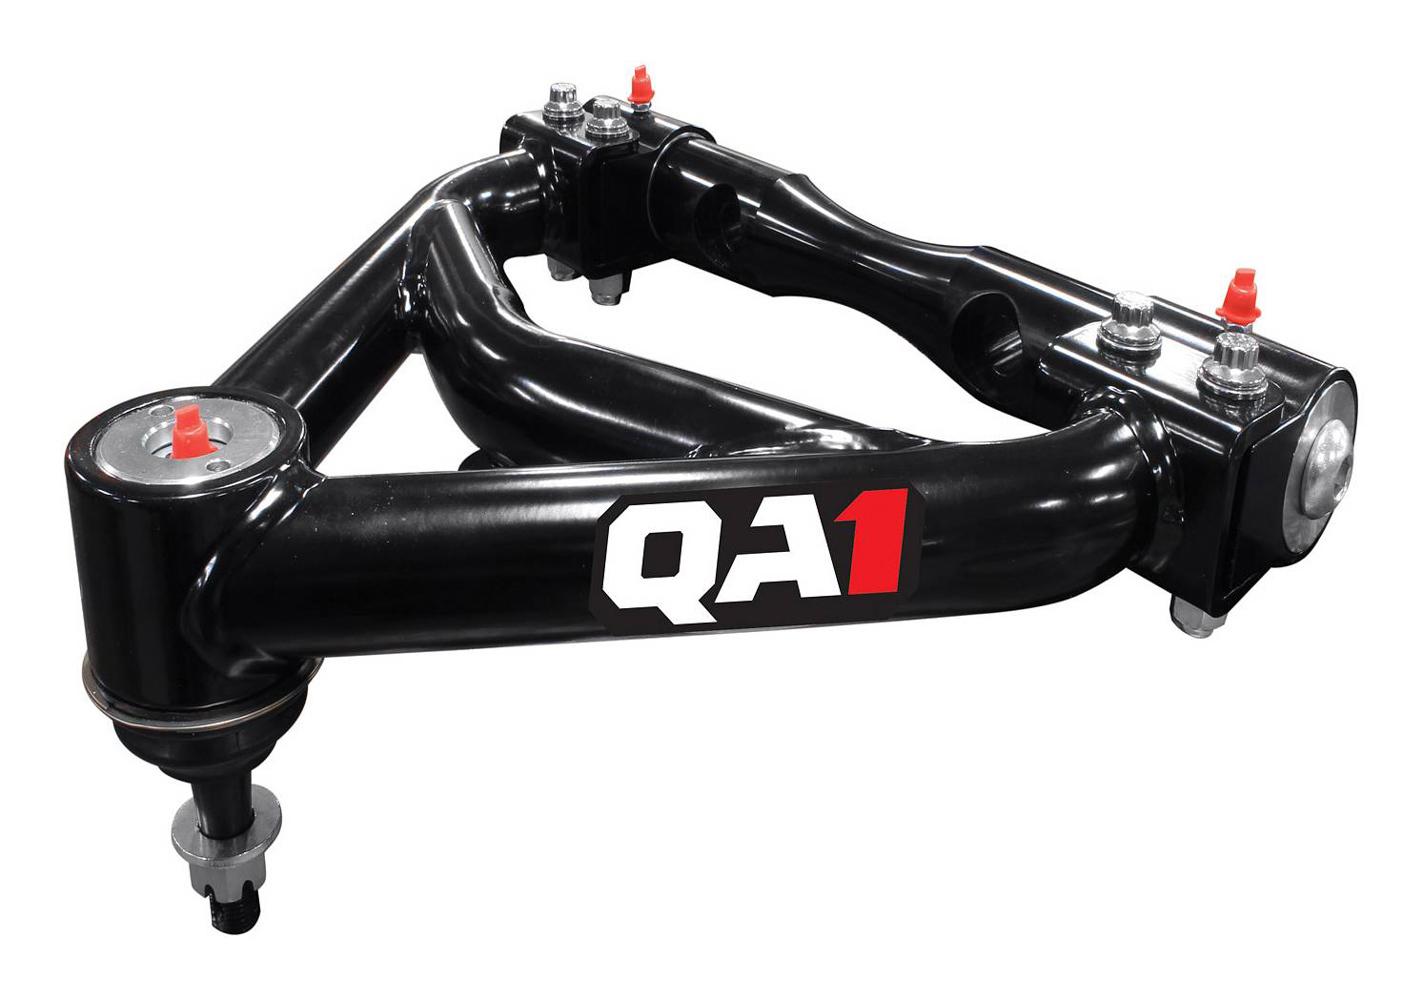 QA1 52602 Control Arm, Tubular, Upper, Polyurethane Bushings, Steel, Black Powder Coat, C10, GM Fullsize Truck, Pair